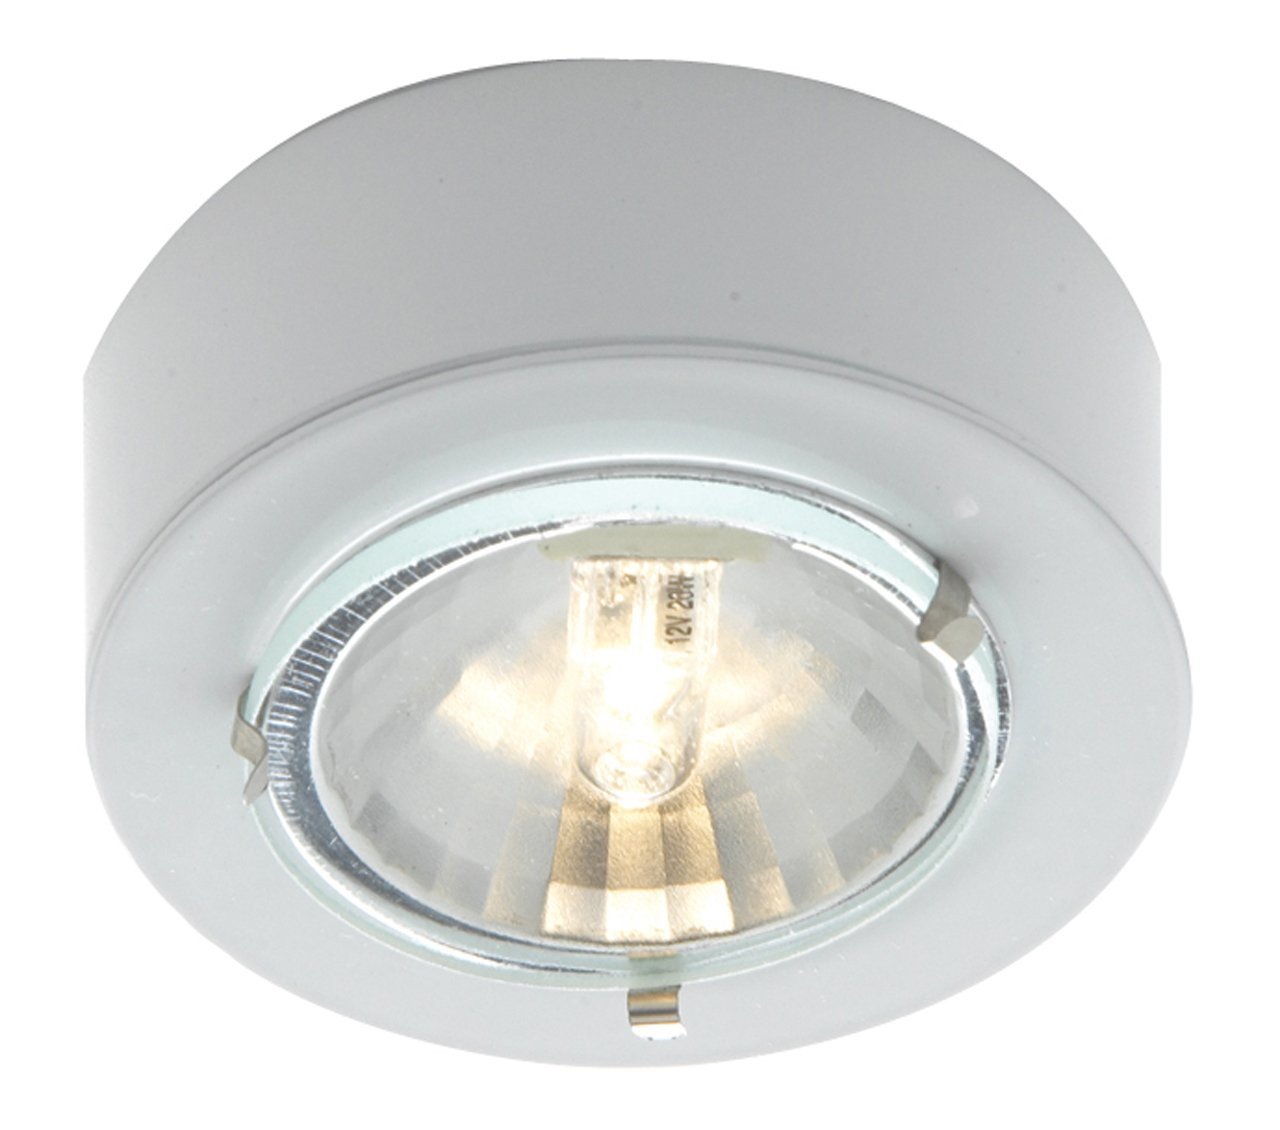 Eurofase R030-02 1-Light Mini Puck Halogen Cabinet Light, White/Aluminum